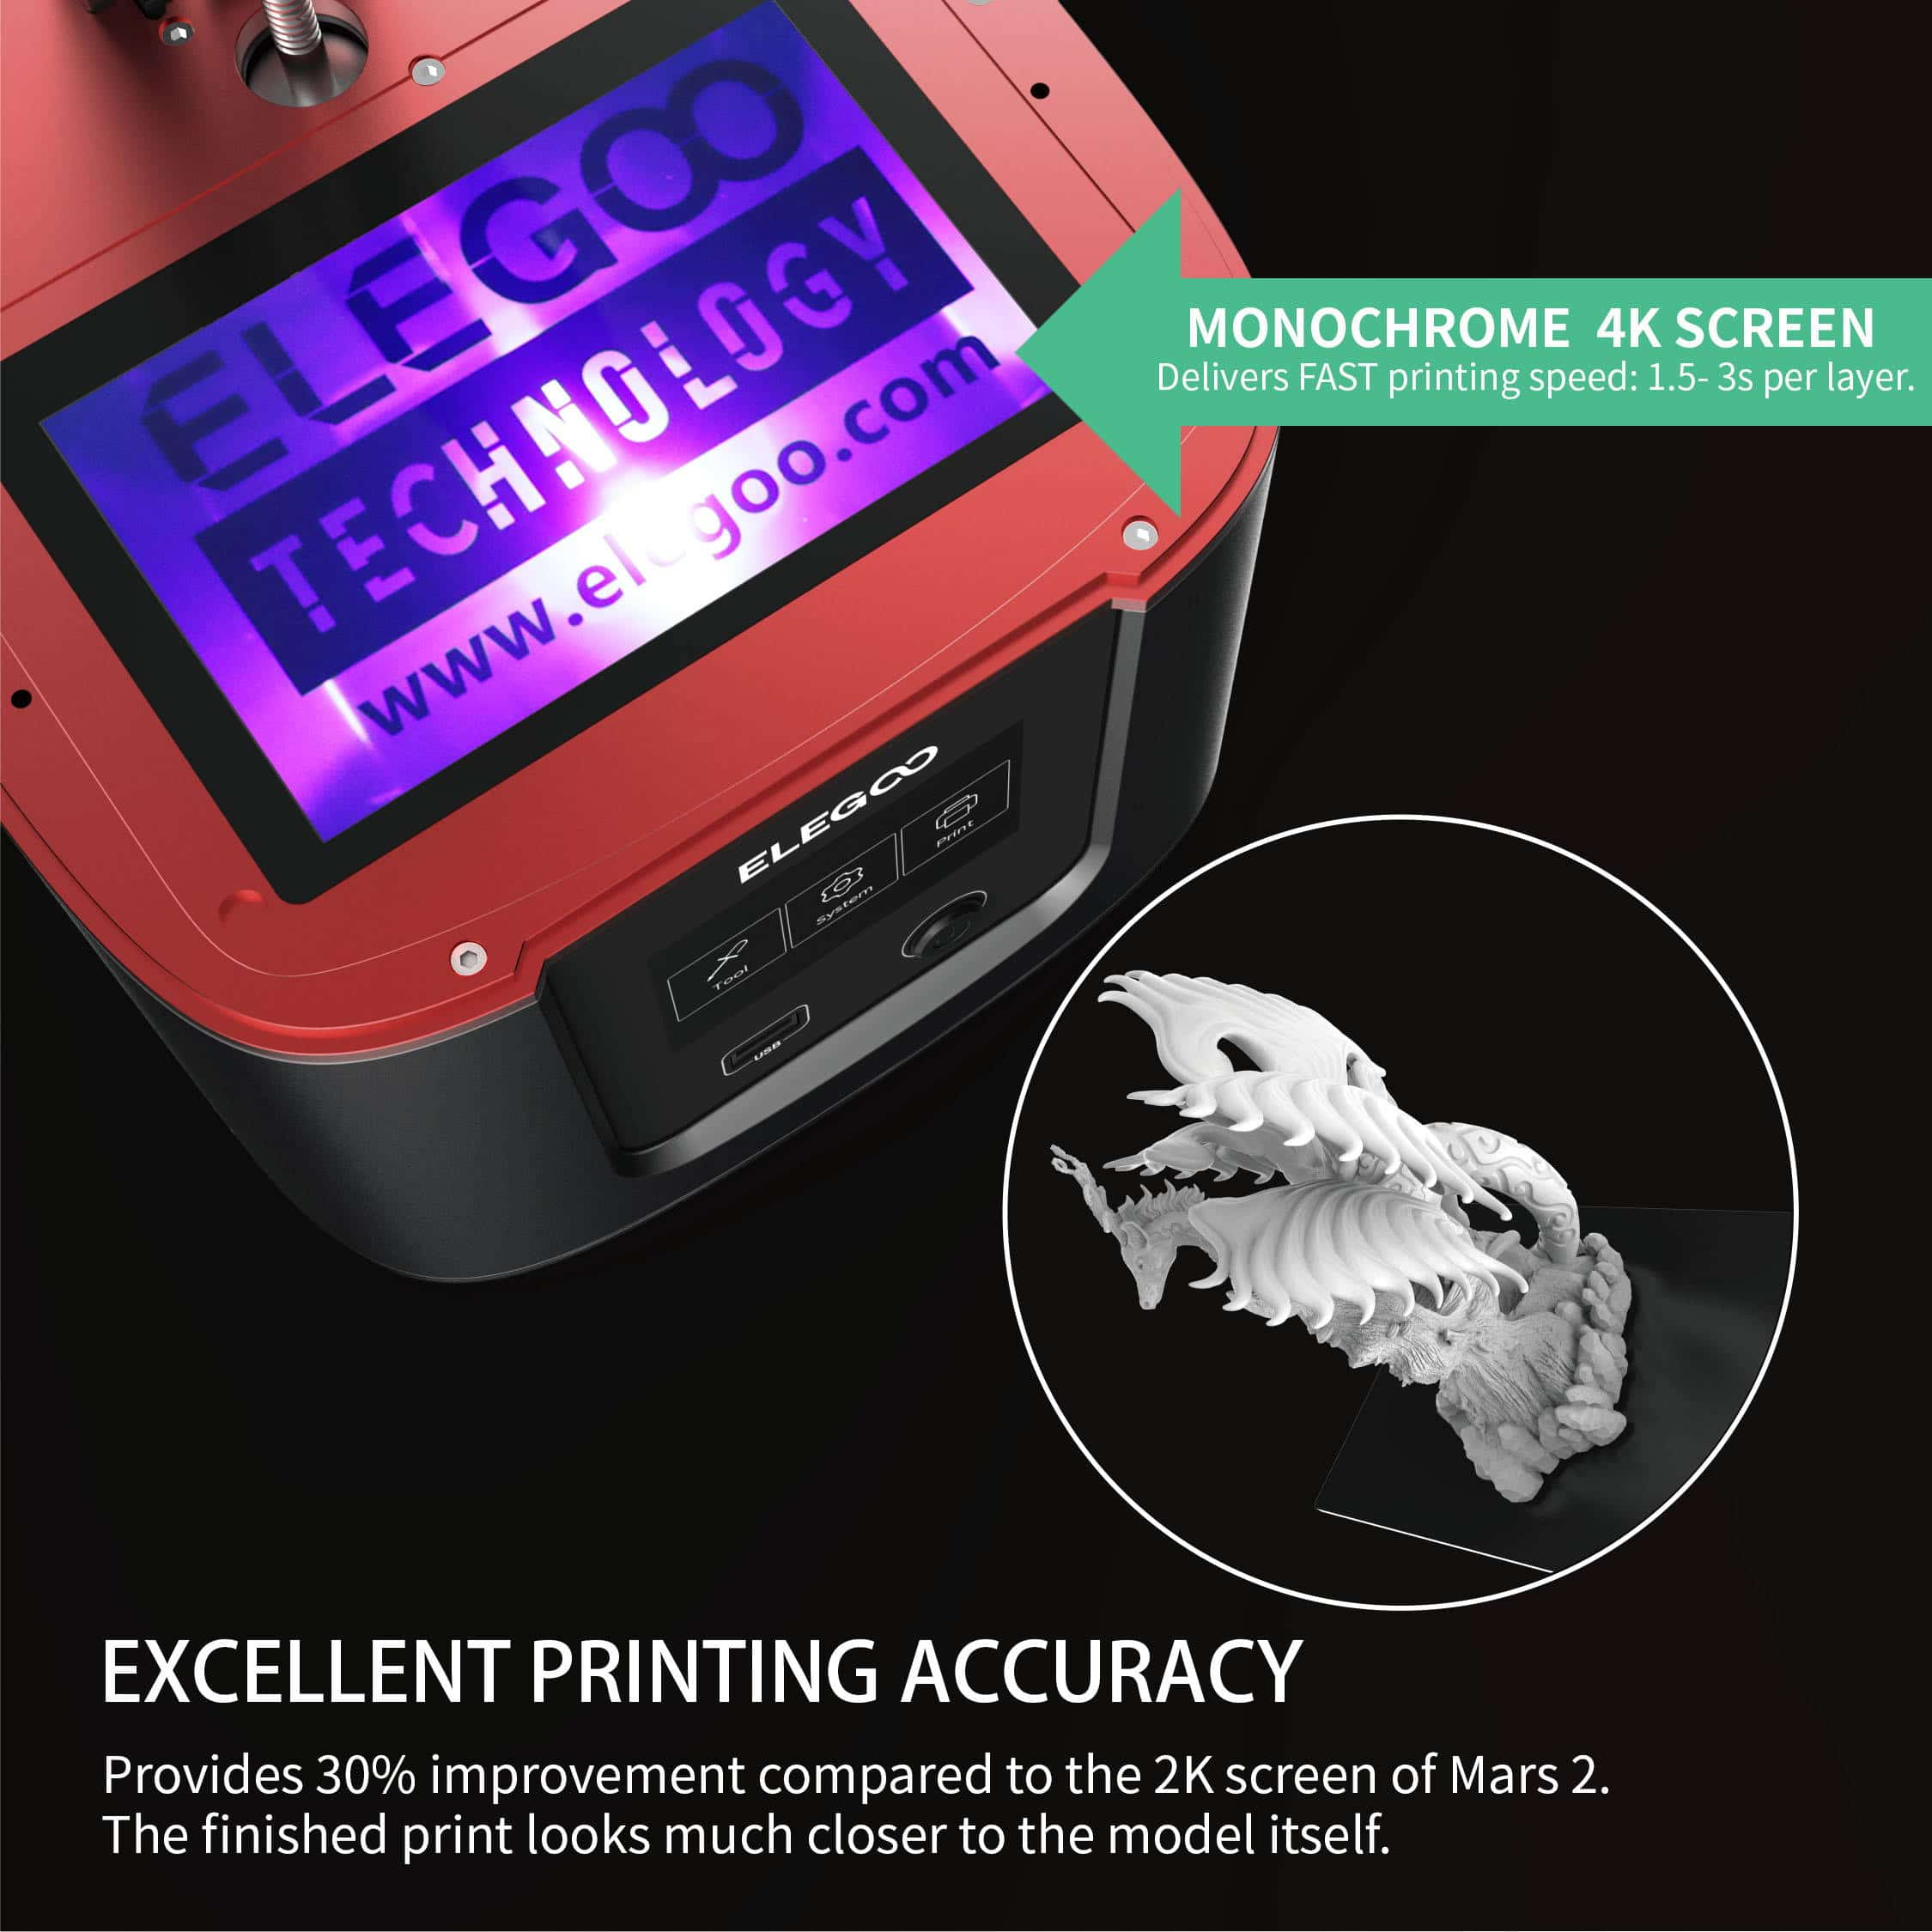 elegoo mars 3 ultra 4K אלגו מארס 3 אולטרה מדפסת שרף